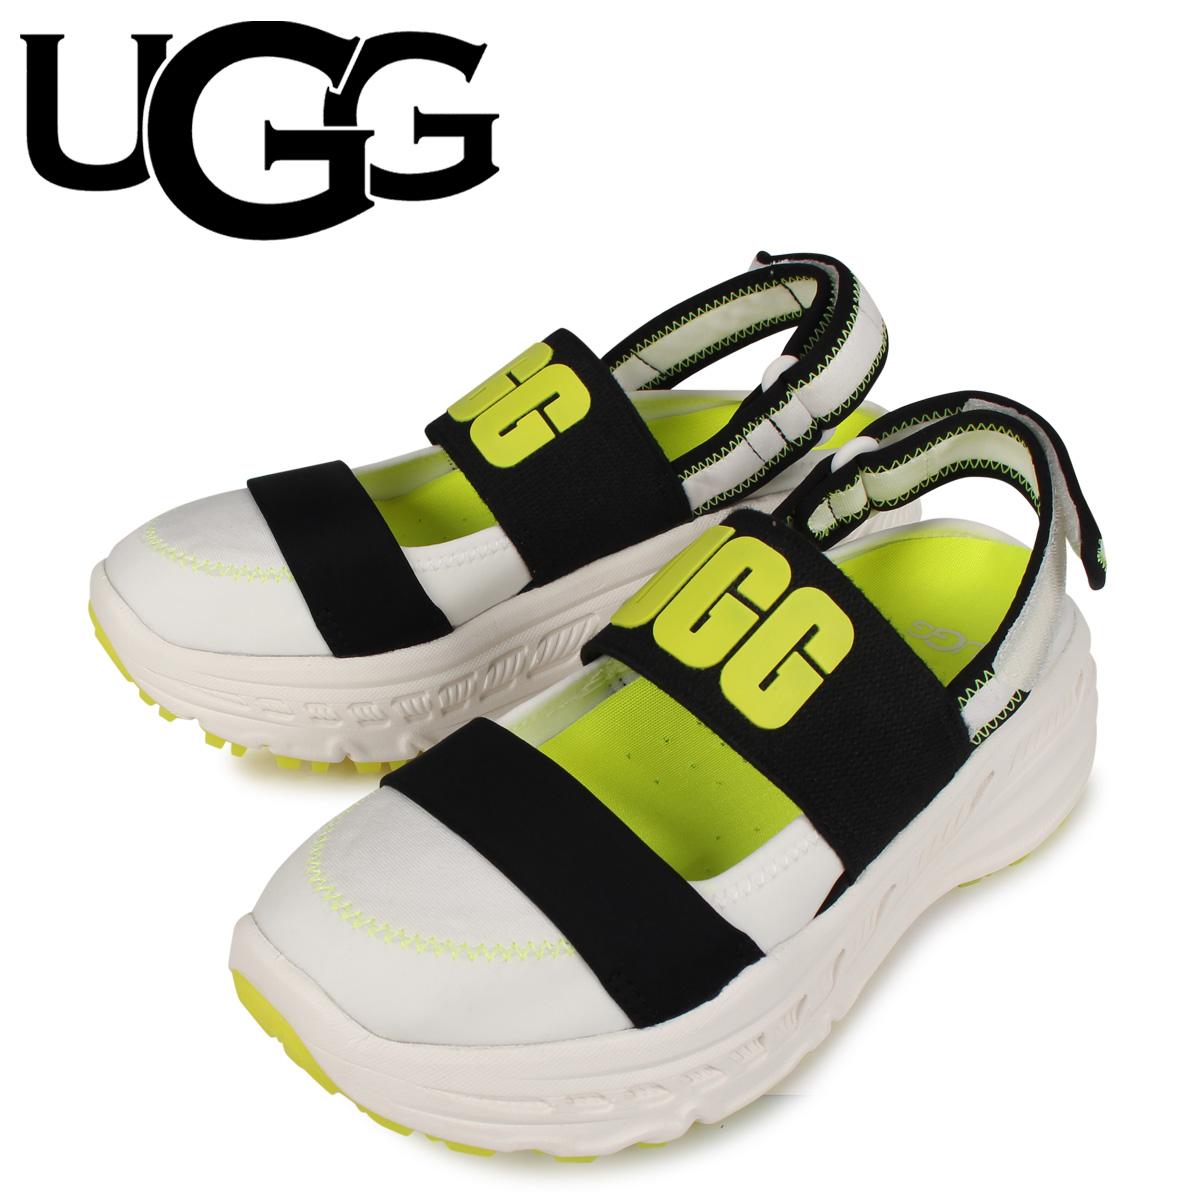 UGG アグ スニーカー スリングバック ランナー レディース SLINGBACK RUNNER ホワイト 白 1097452 [3/19 新入荷]